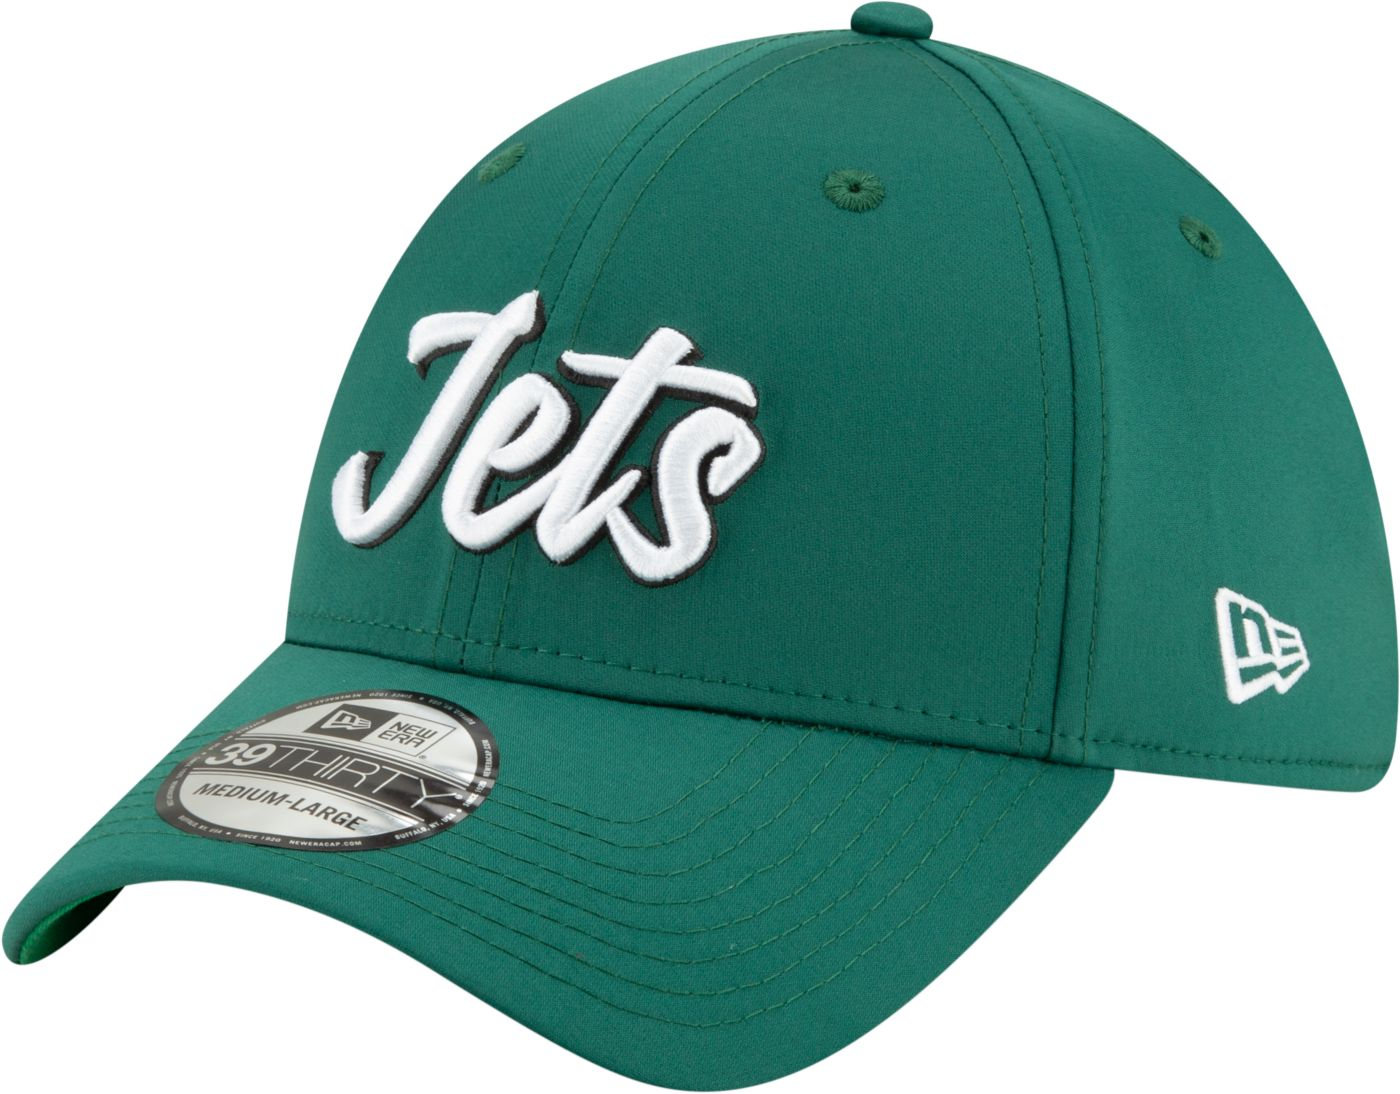 New Era Men's New York Jets Sideline Home 39Thirty Stretch Fit Hat